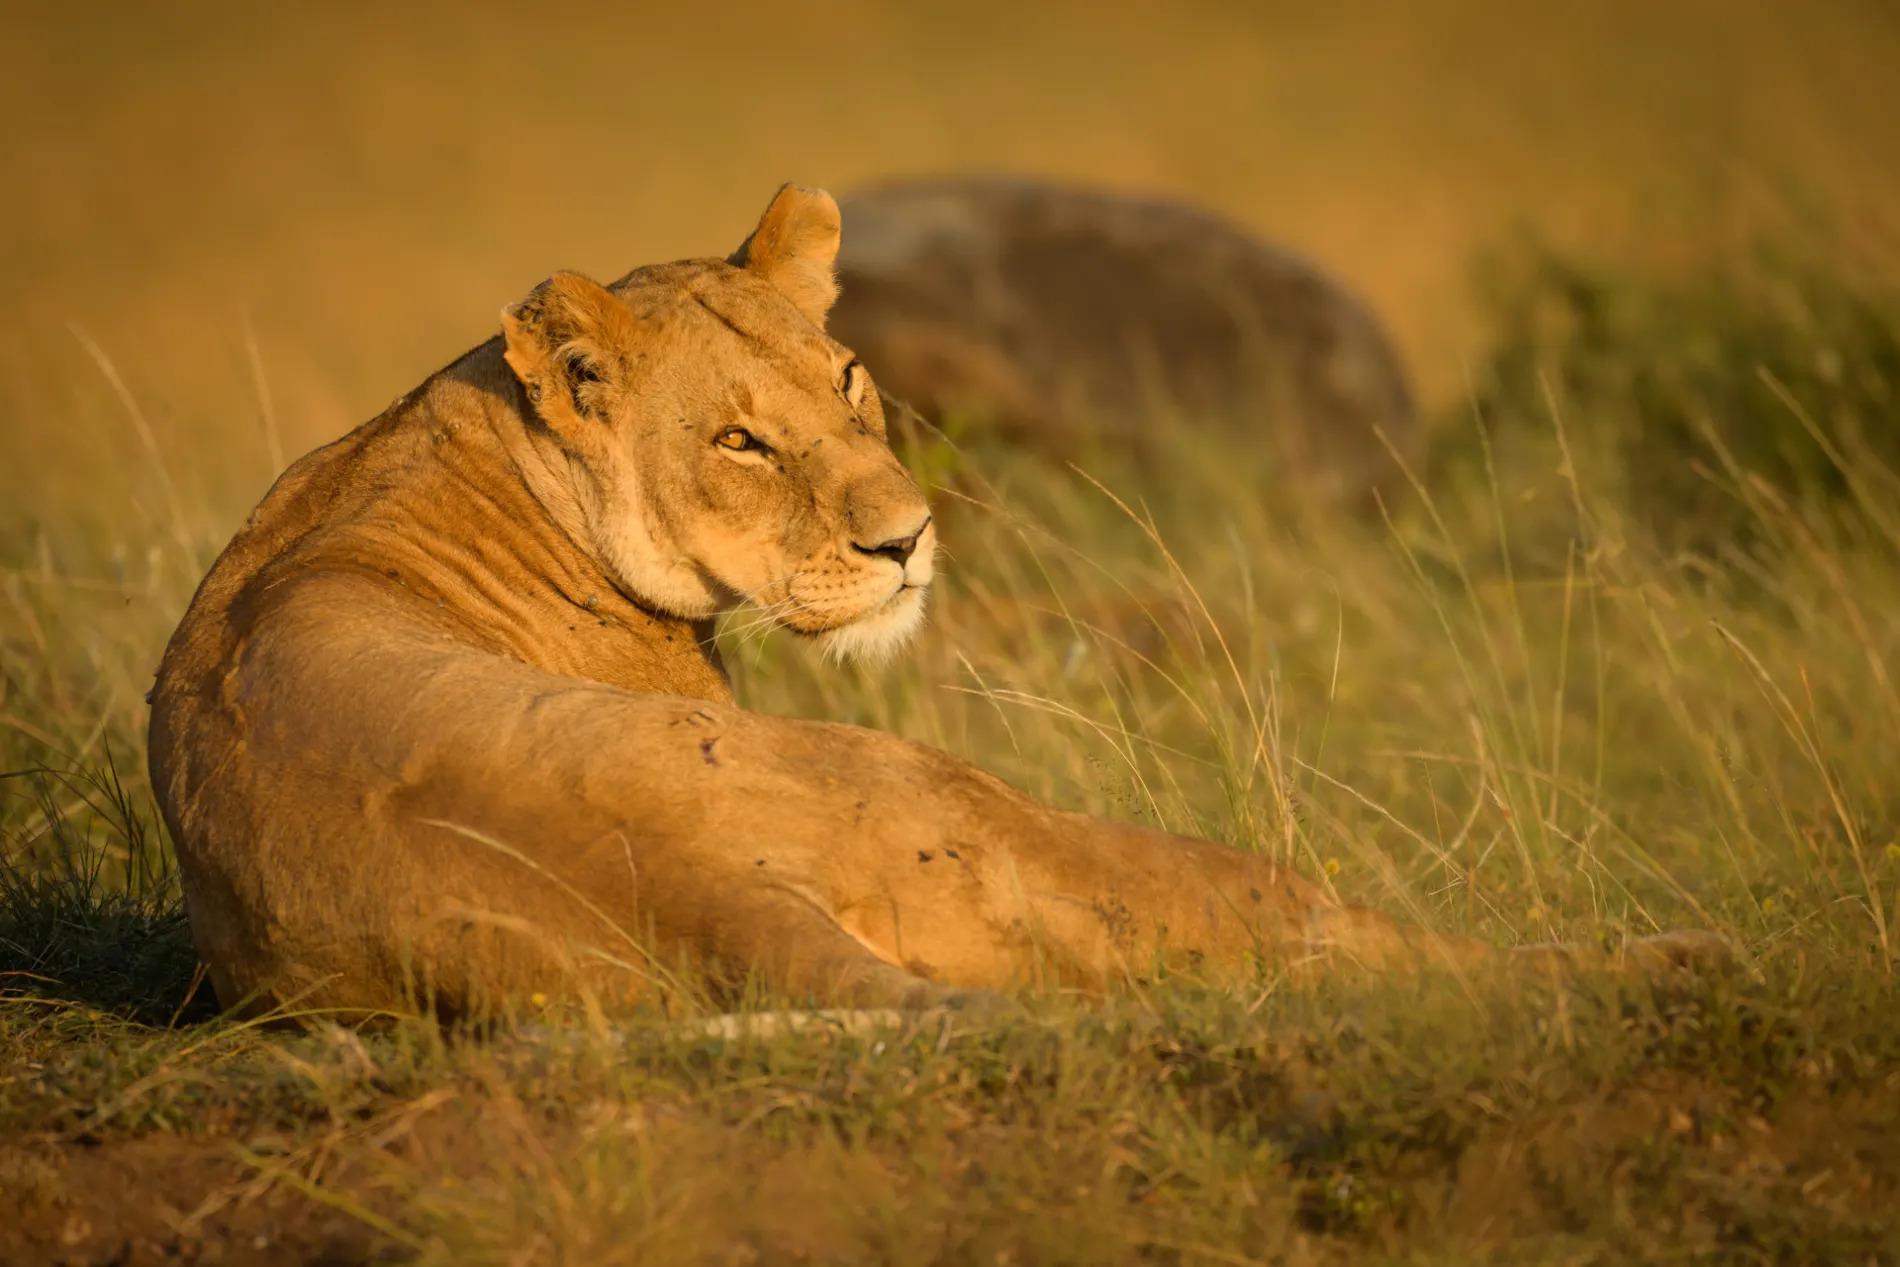 Lioness overshoulder stare